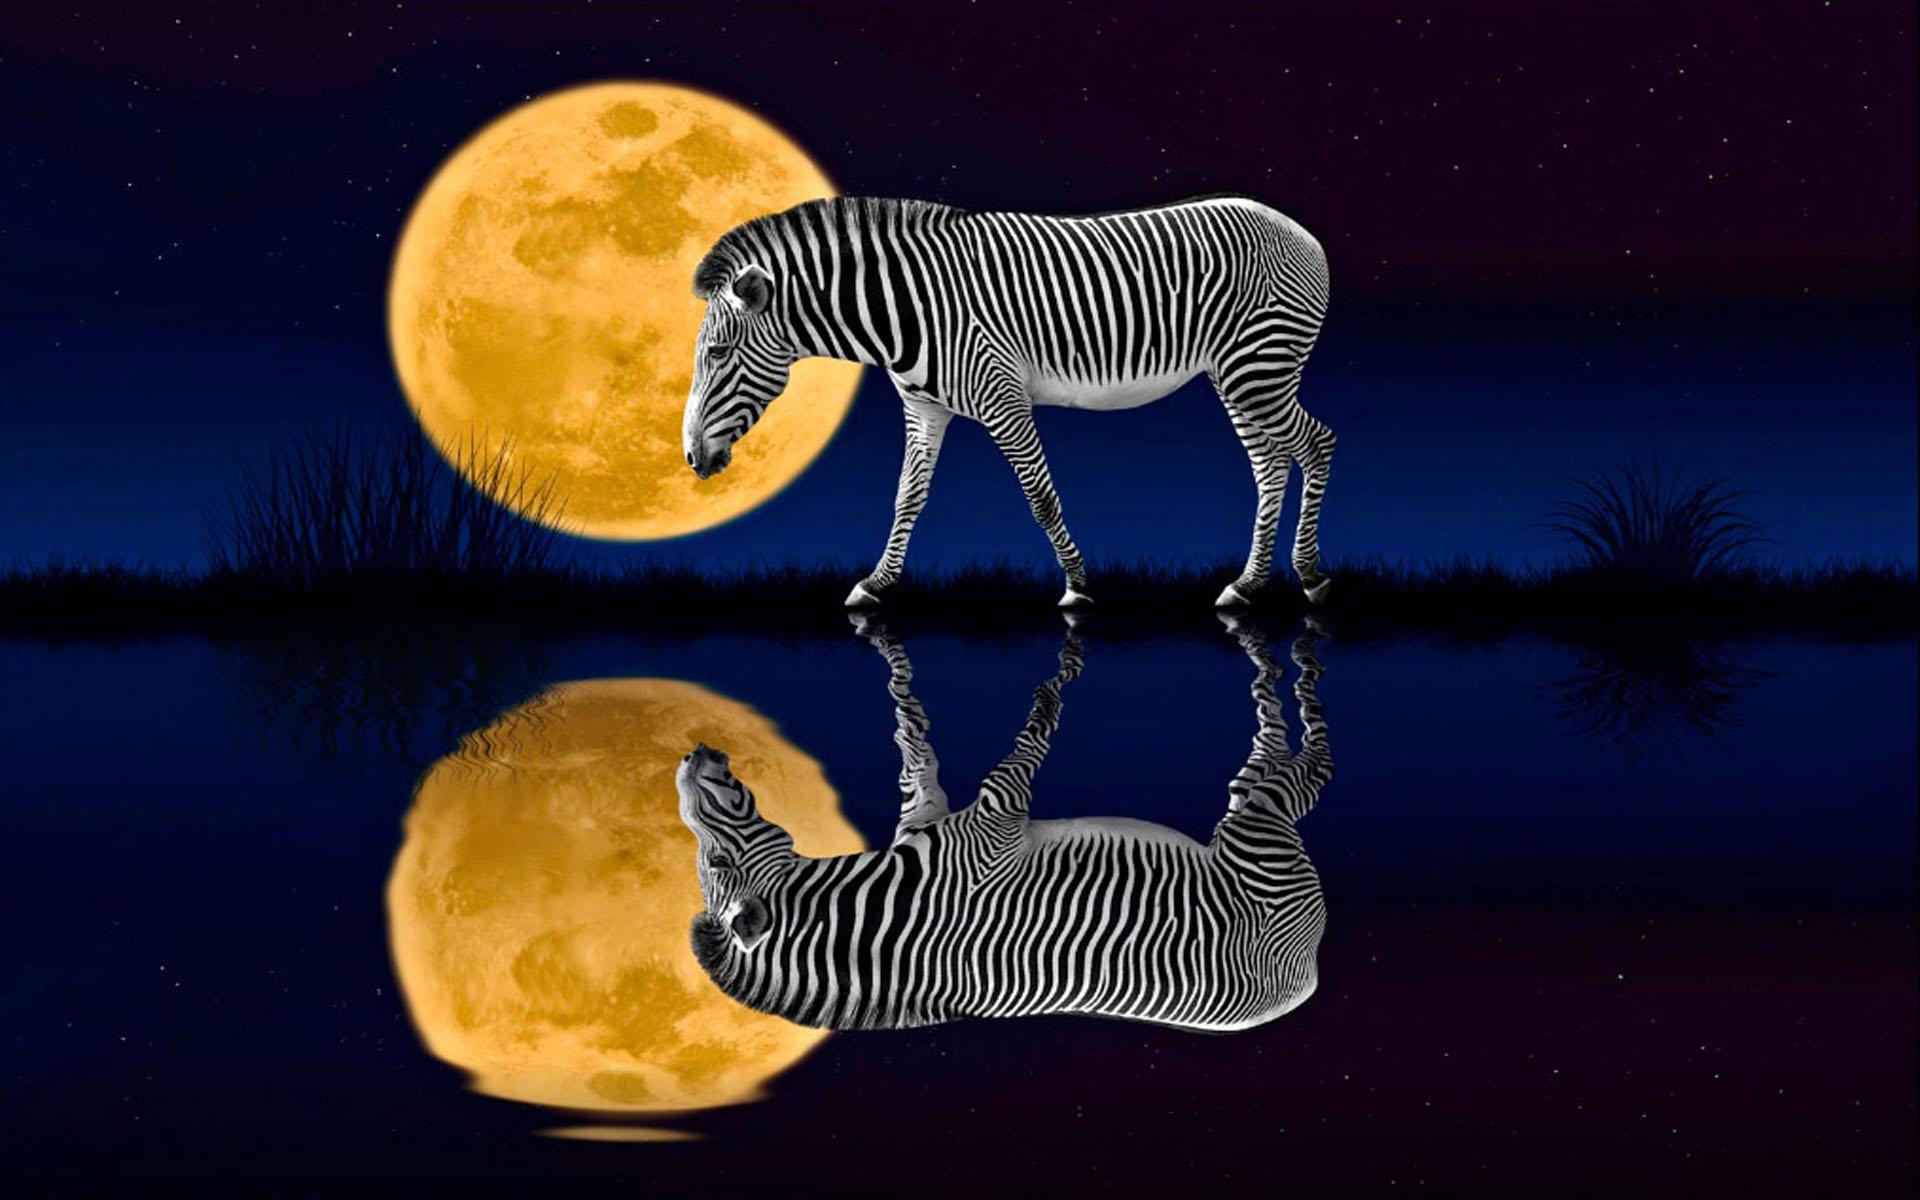 Cute Penguin Wallpaper Desktop Night Zebra Full Moon Reflected In The Water Desktop